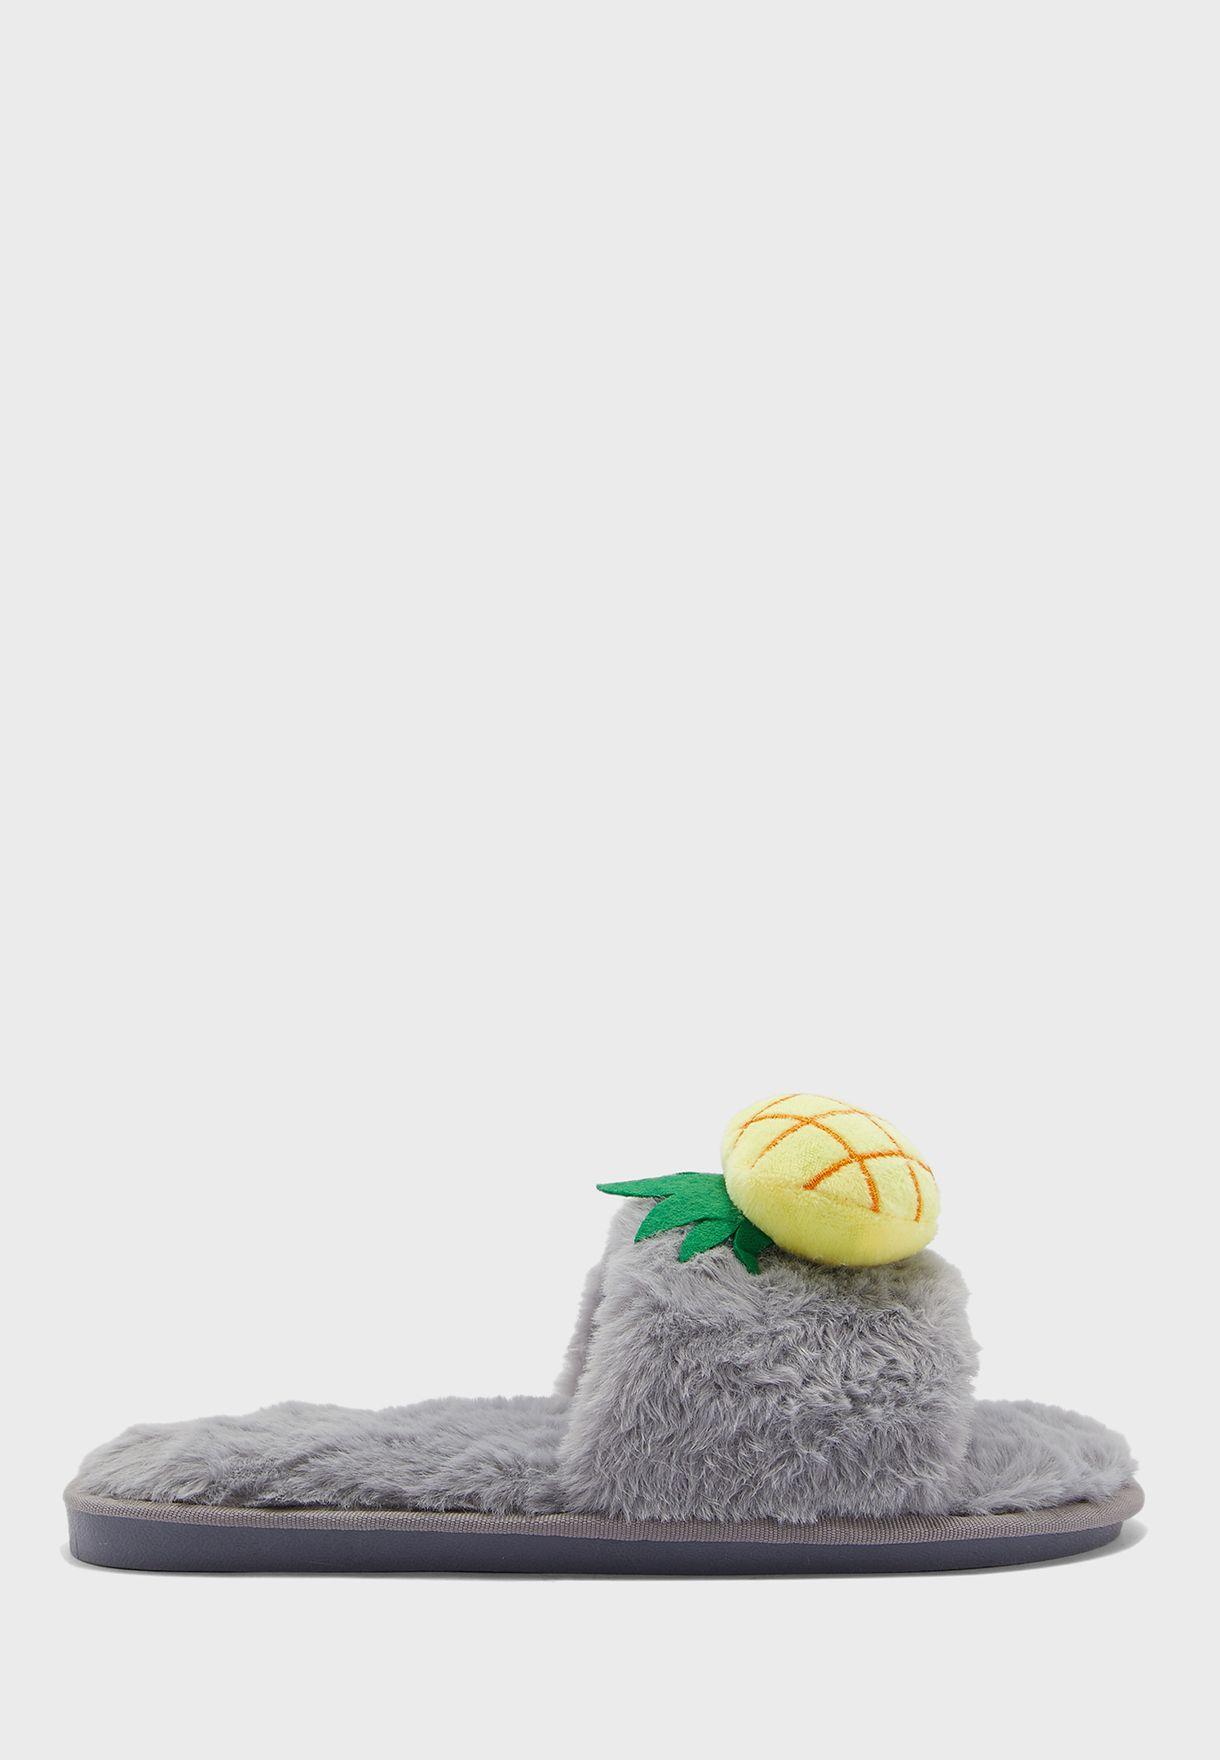 Pineapple Open Toe Bedroom Slippers